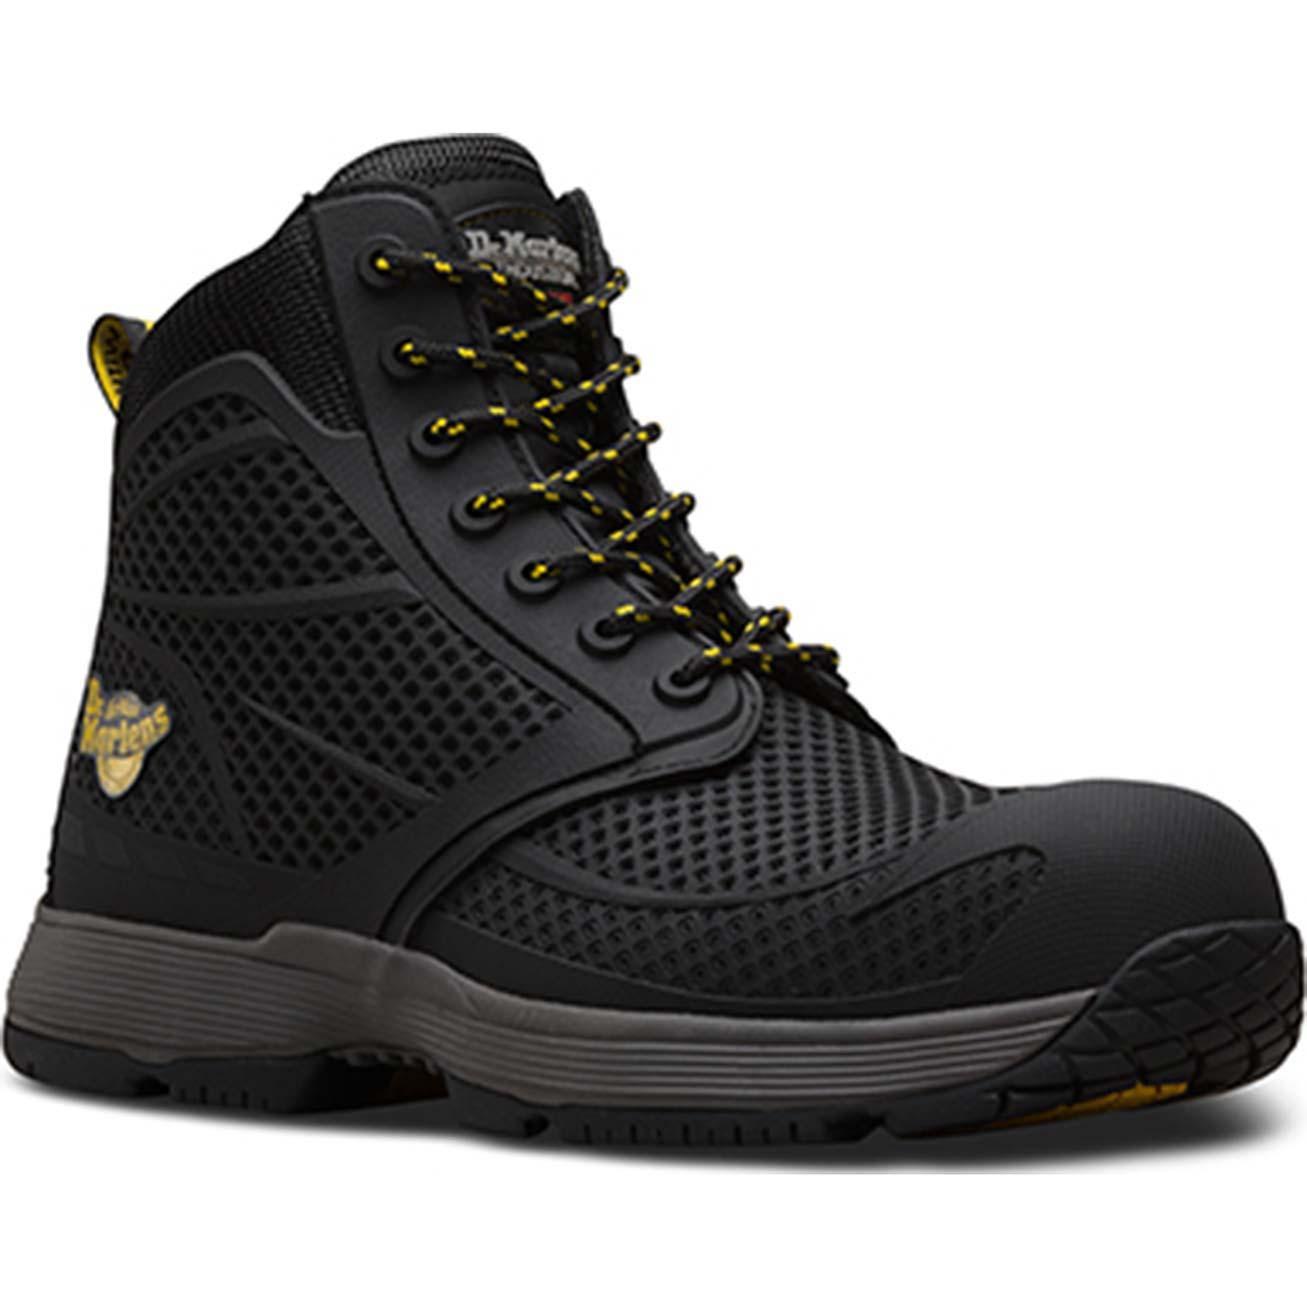 b4b68616609 Dr. Martens Calamus Composite Toe Work Boot